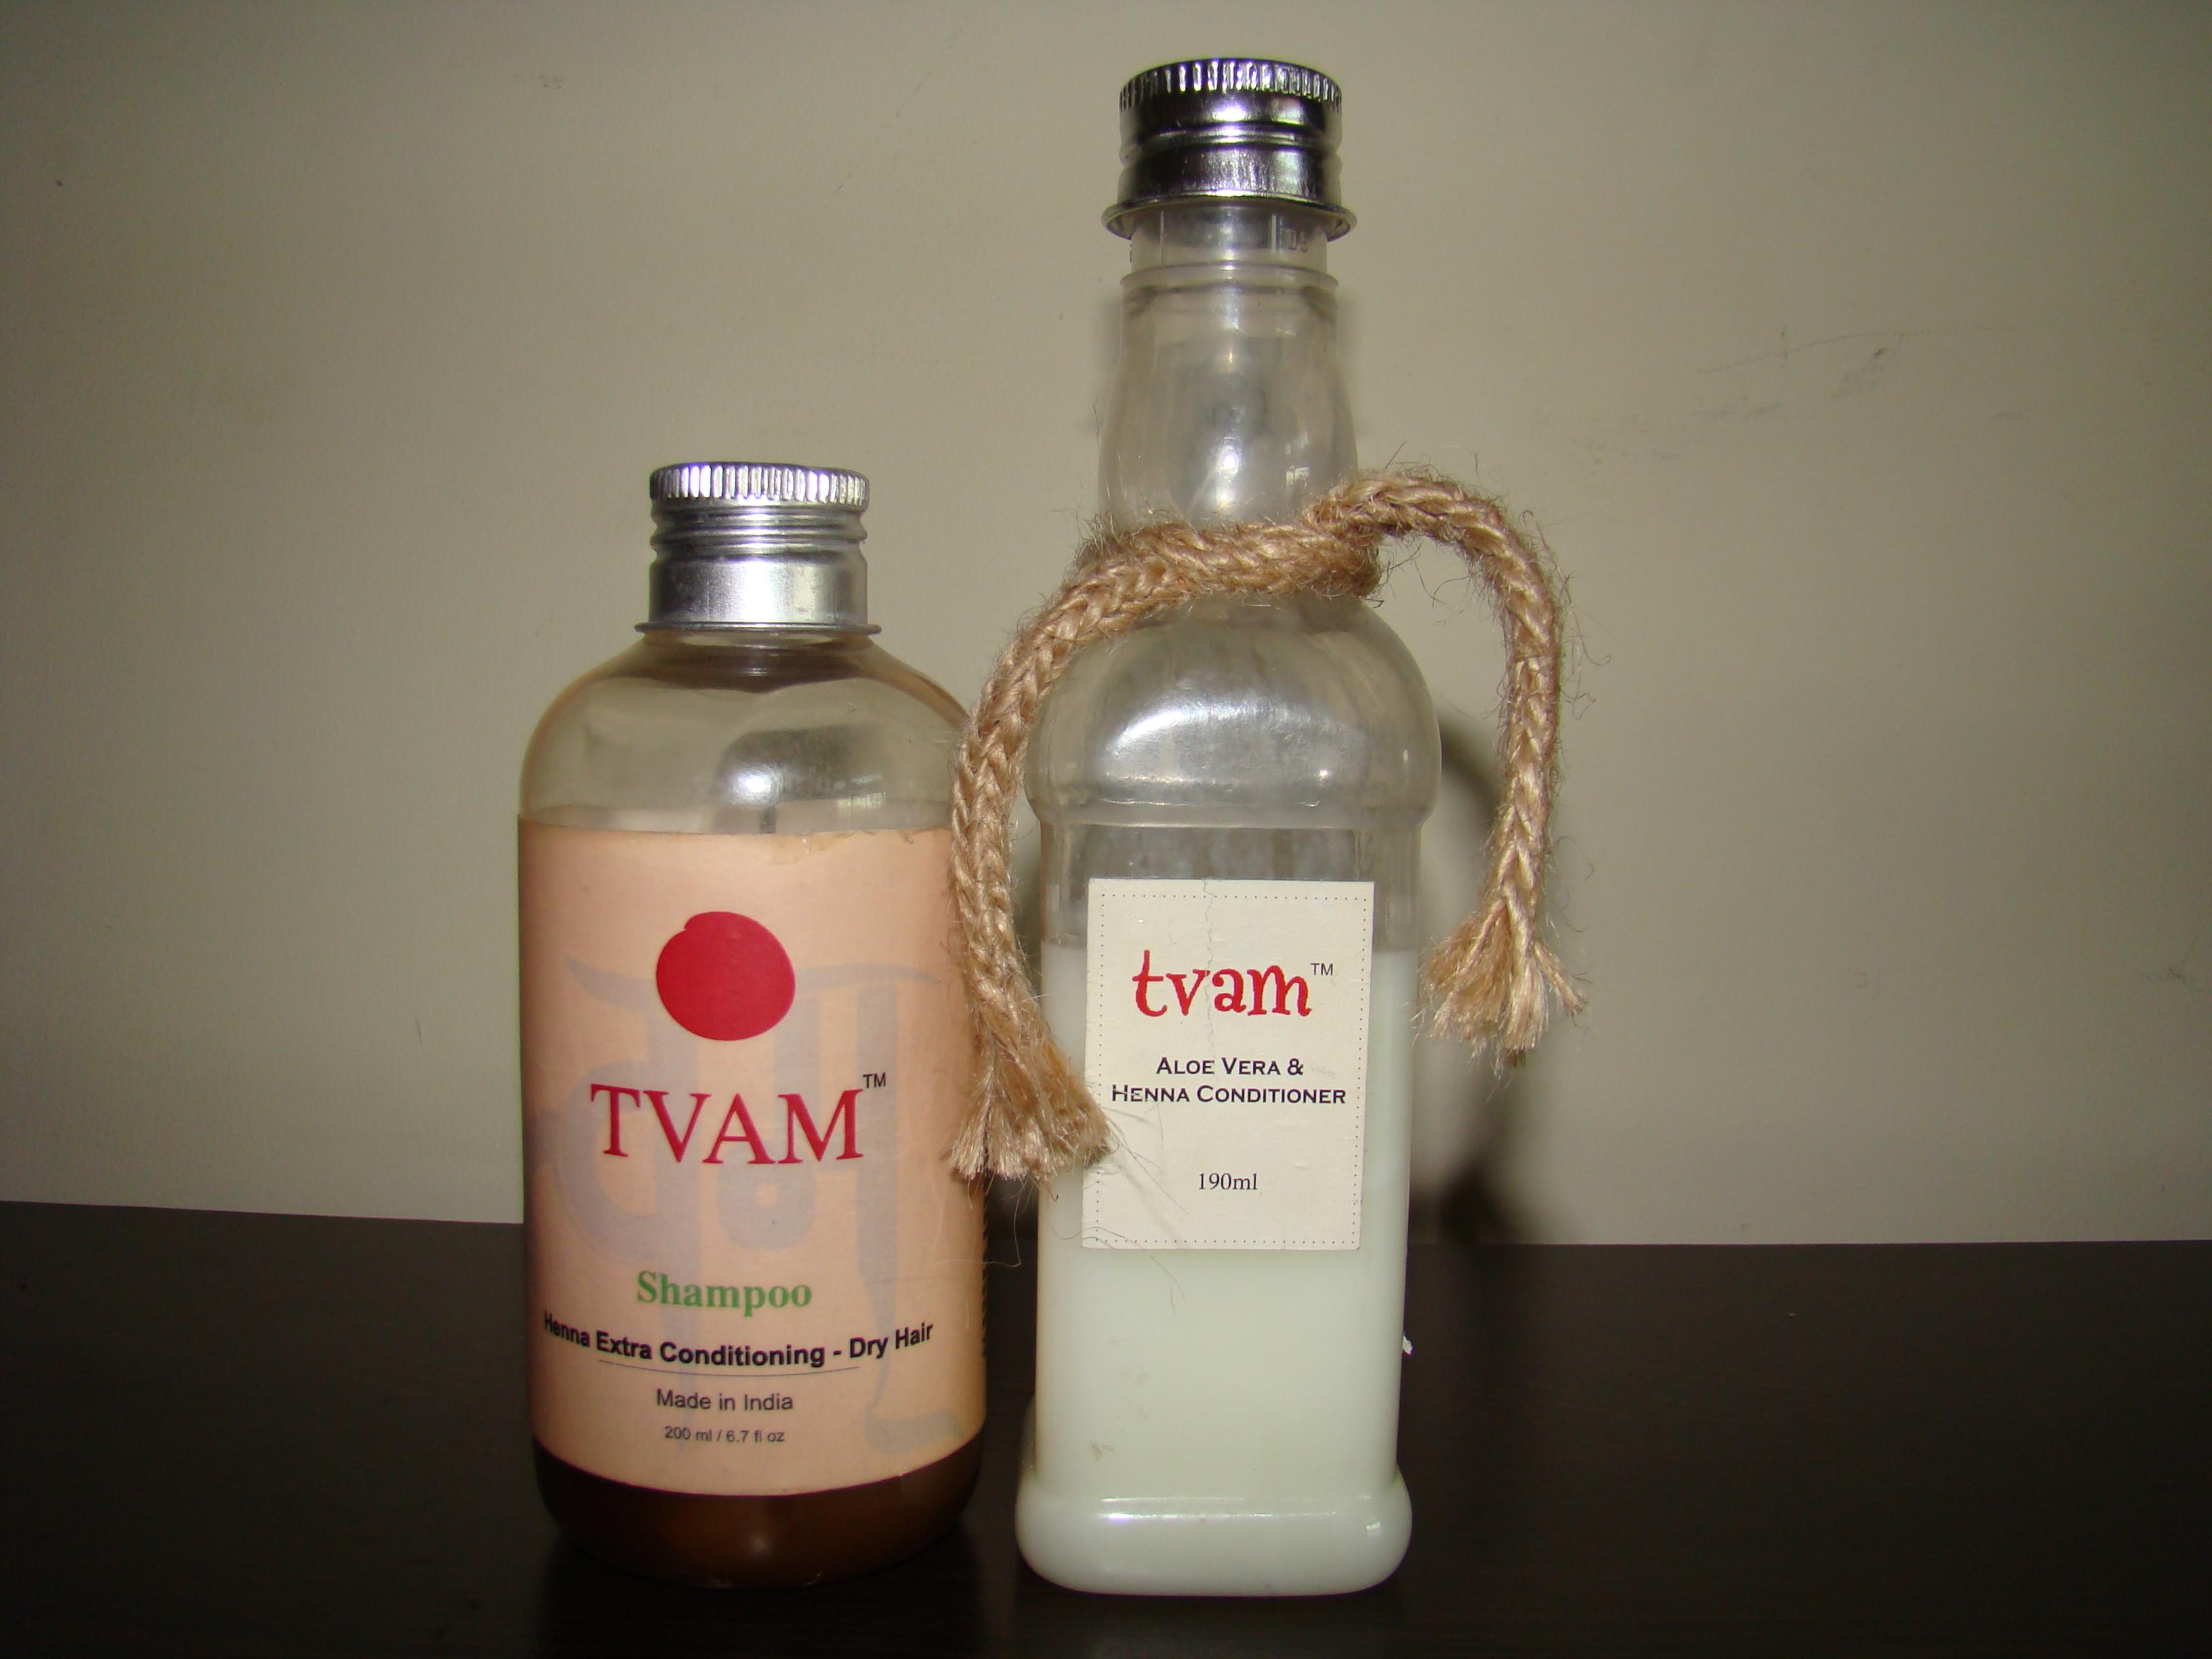 Mehndi For Conditioning Hair : Tvam henna extra conditioning shampoo and aloe vera